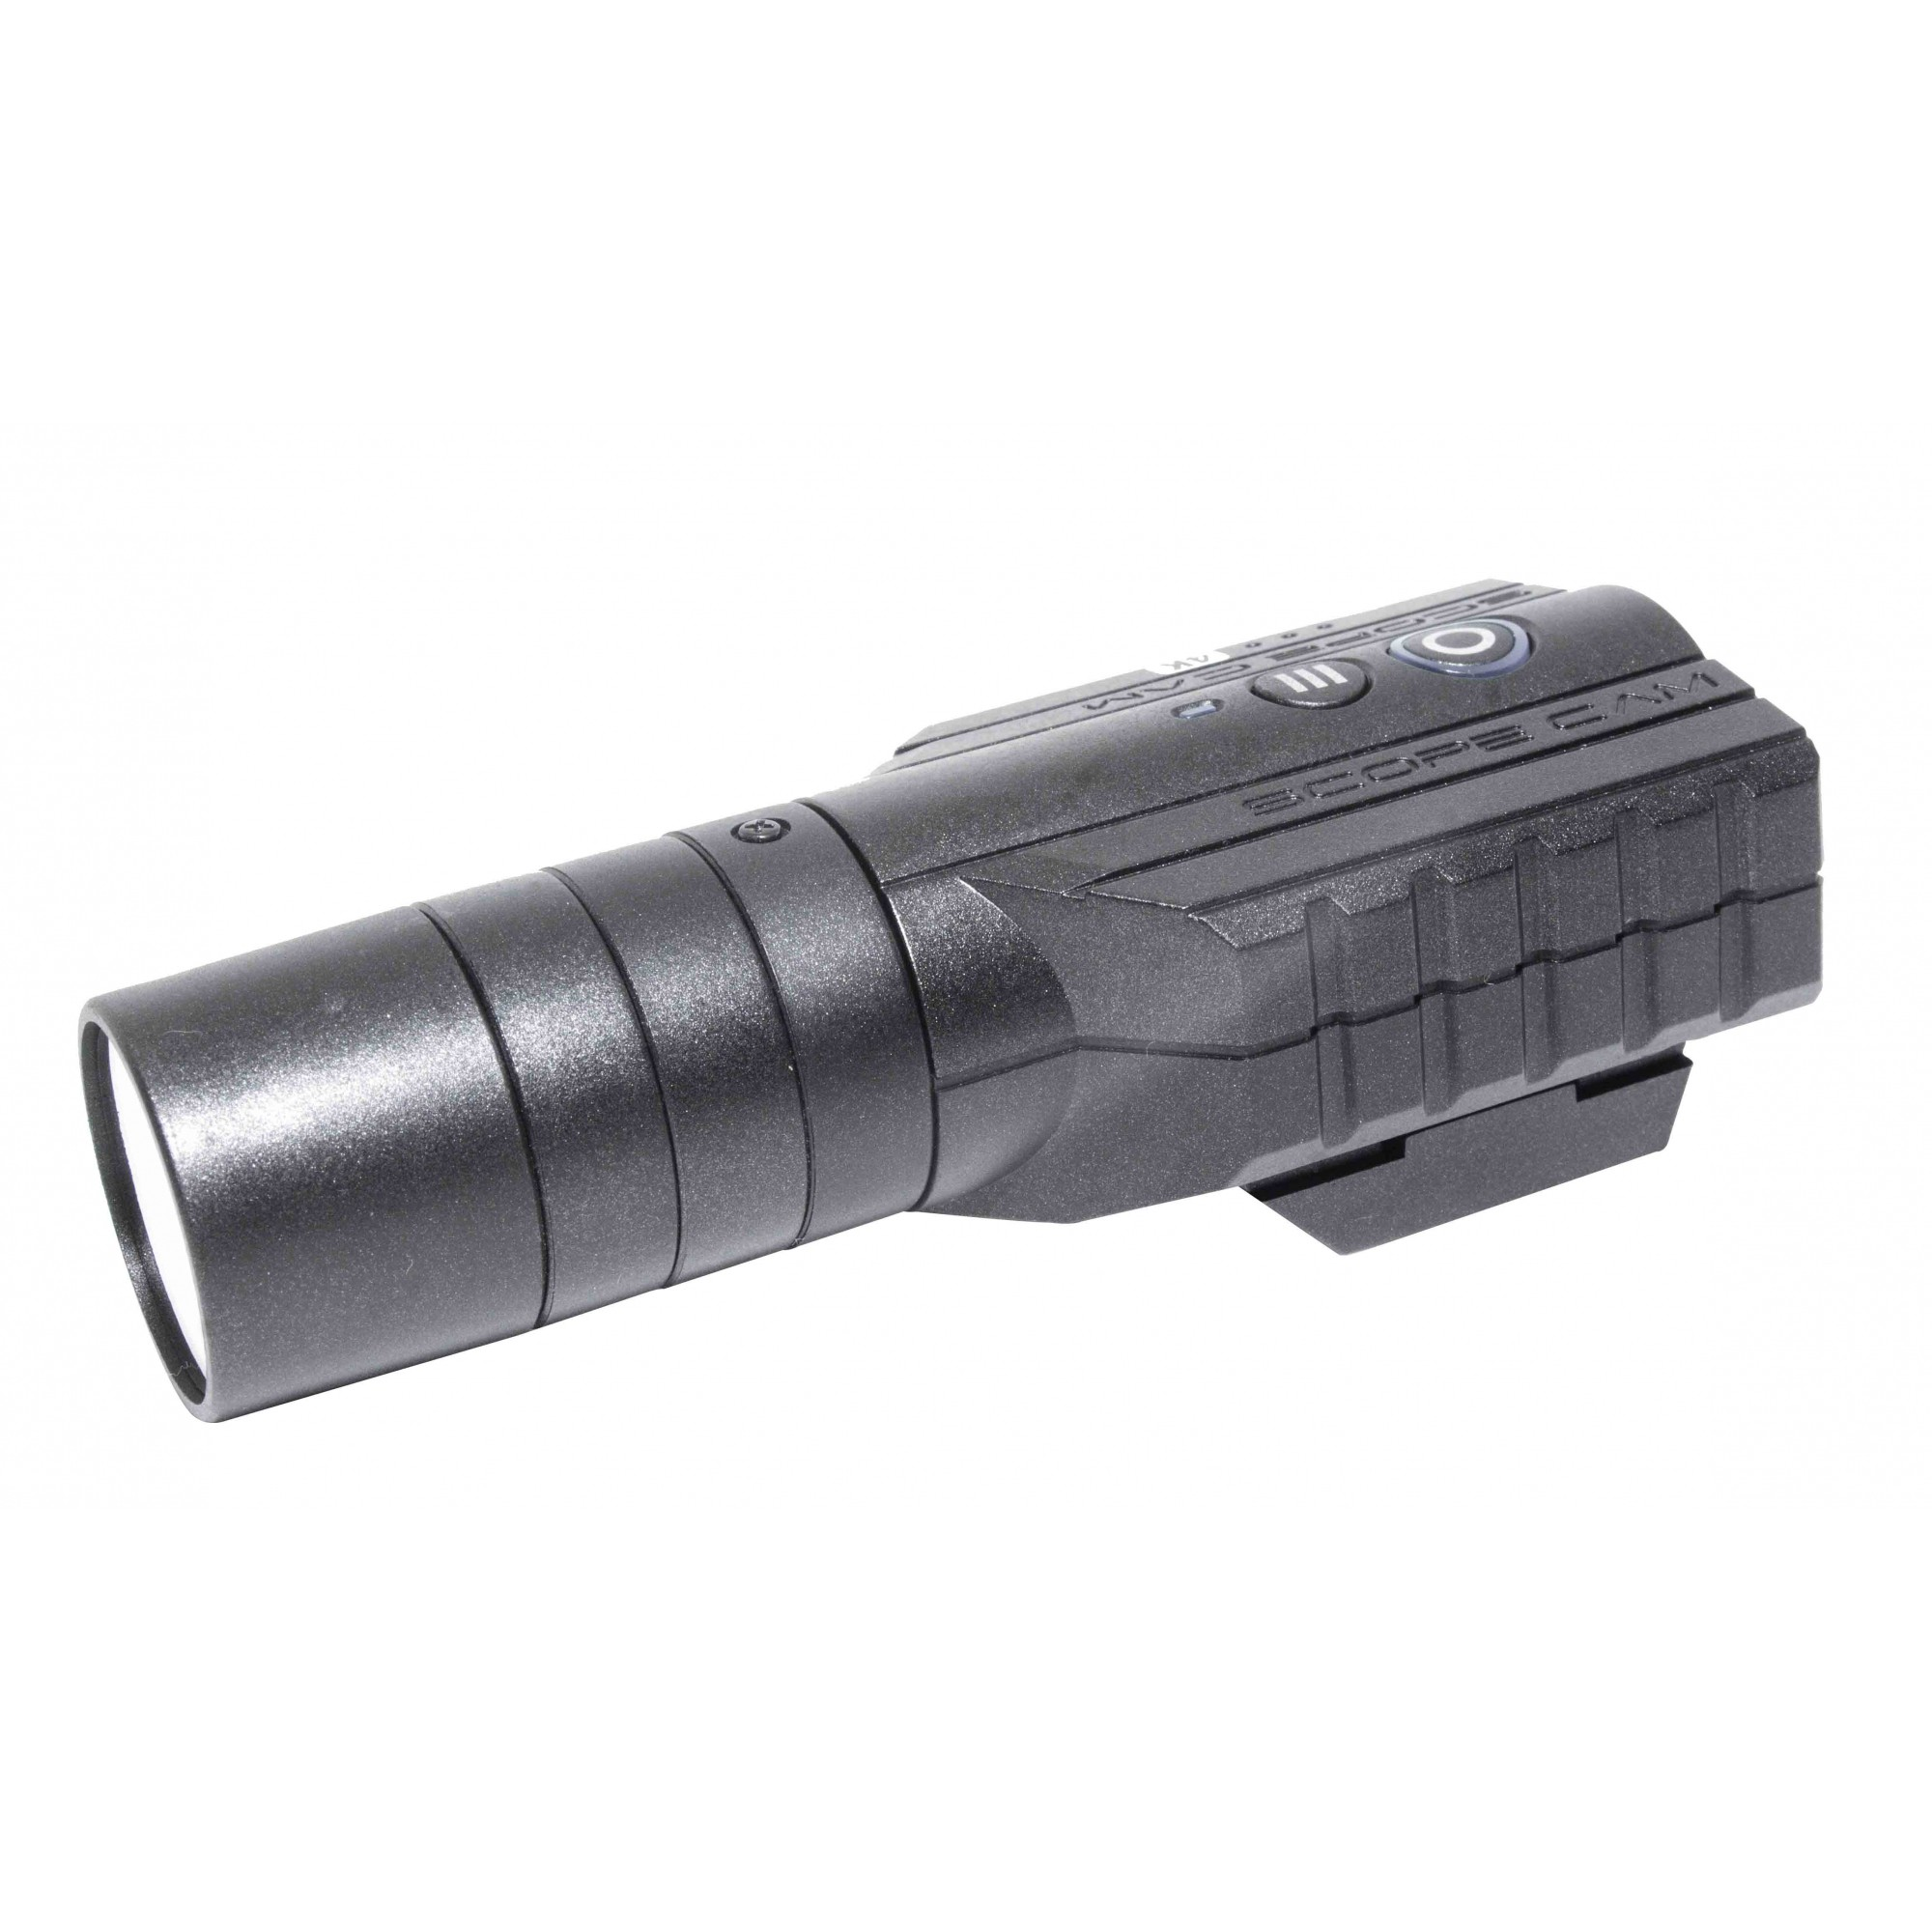 Scope Cam 4K DMR Sniper